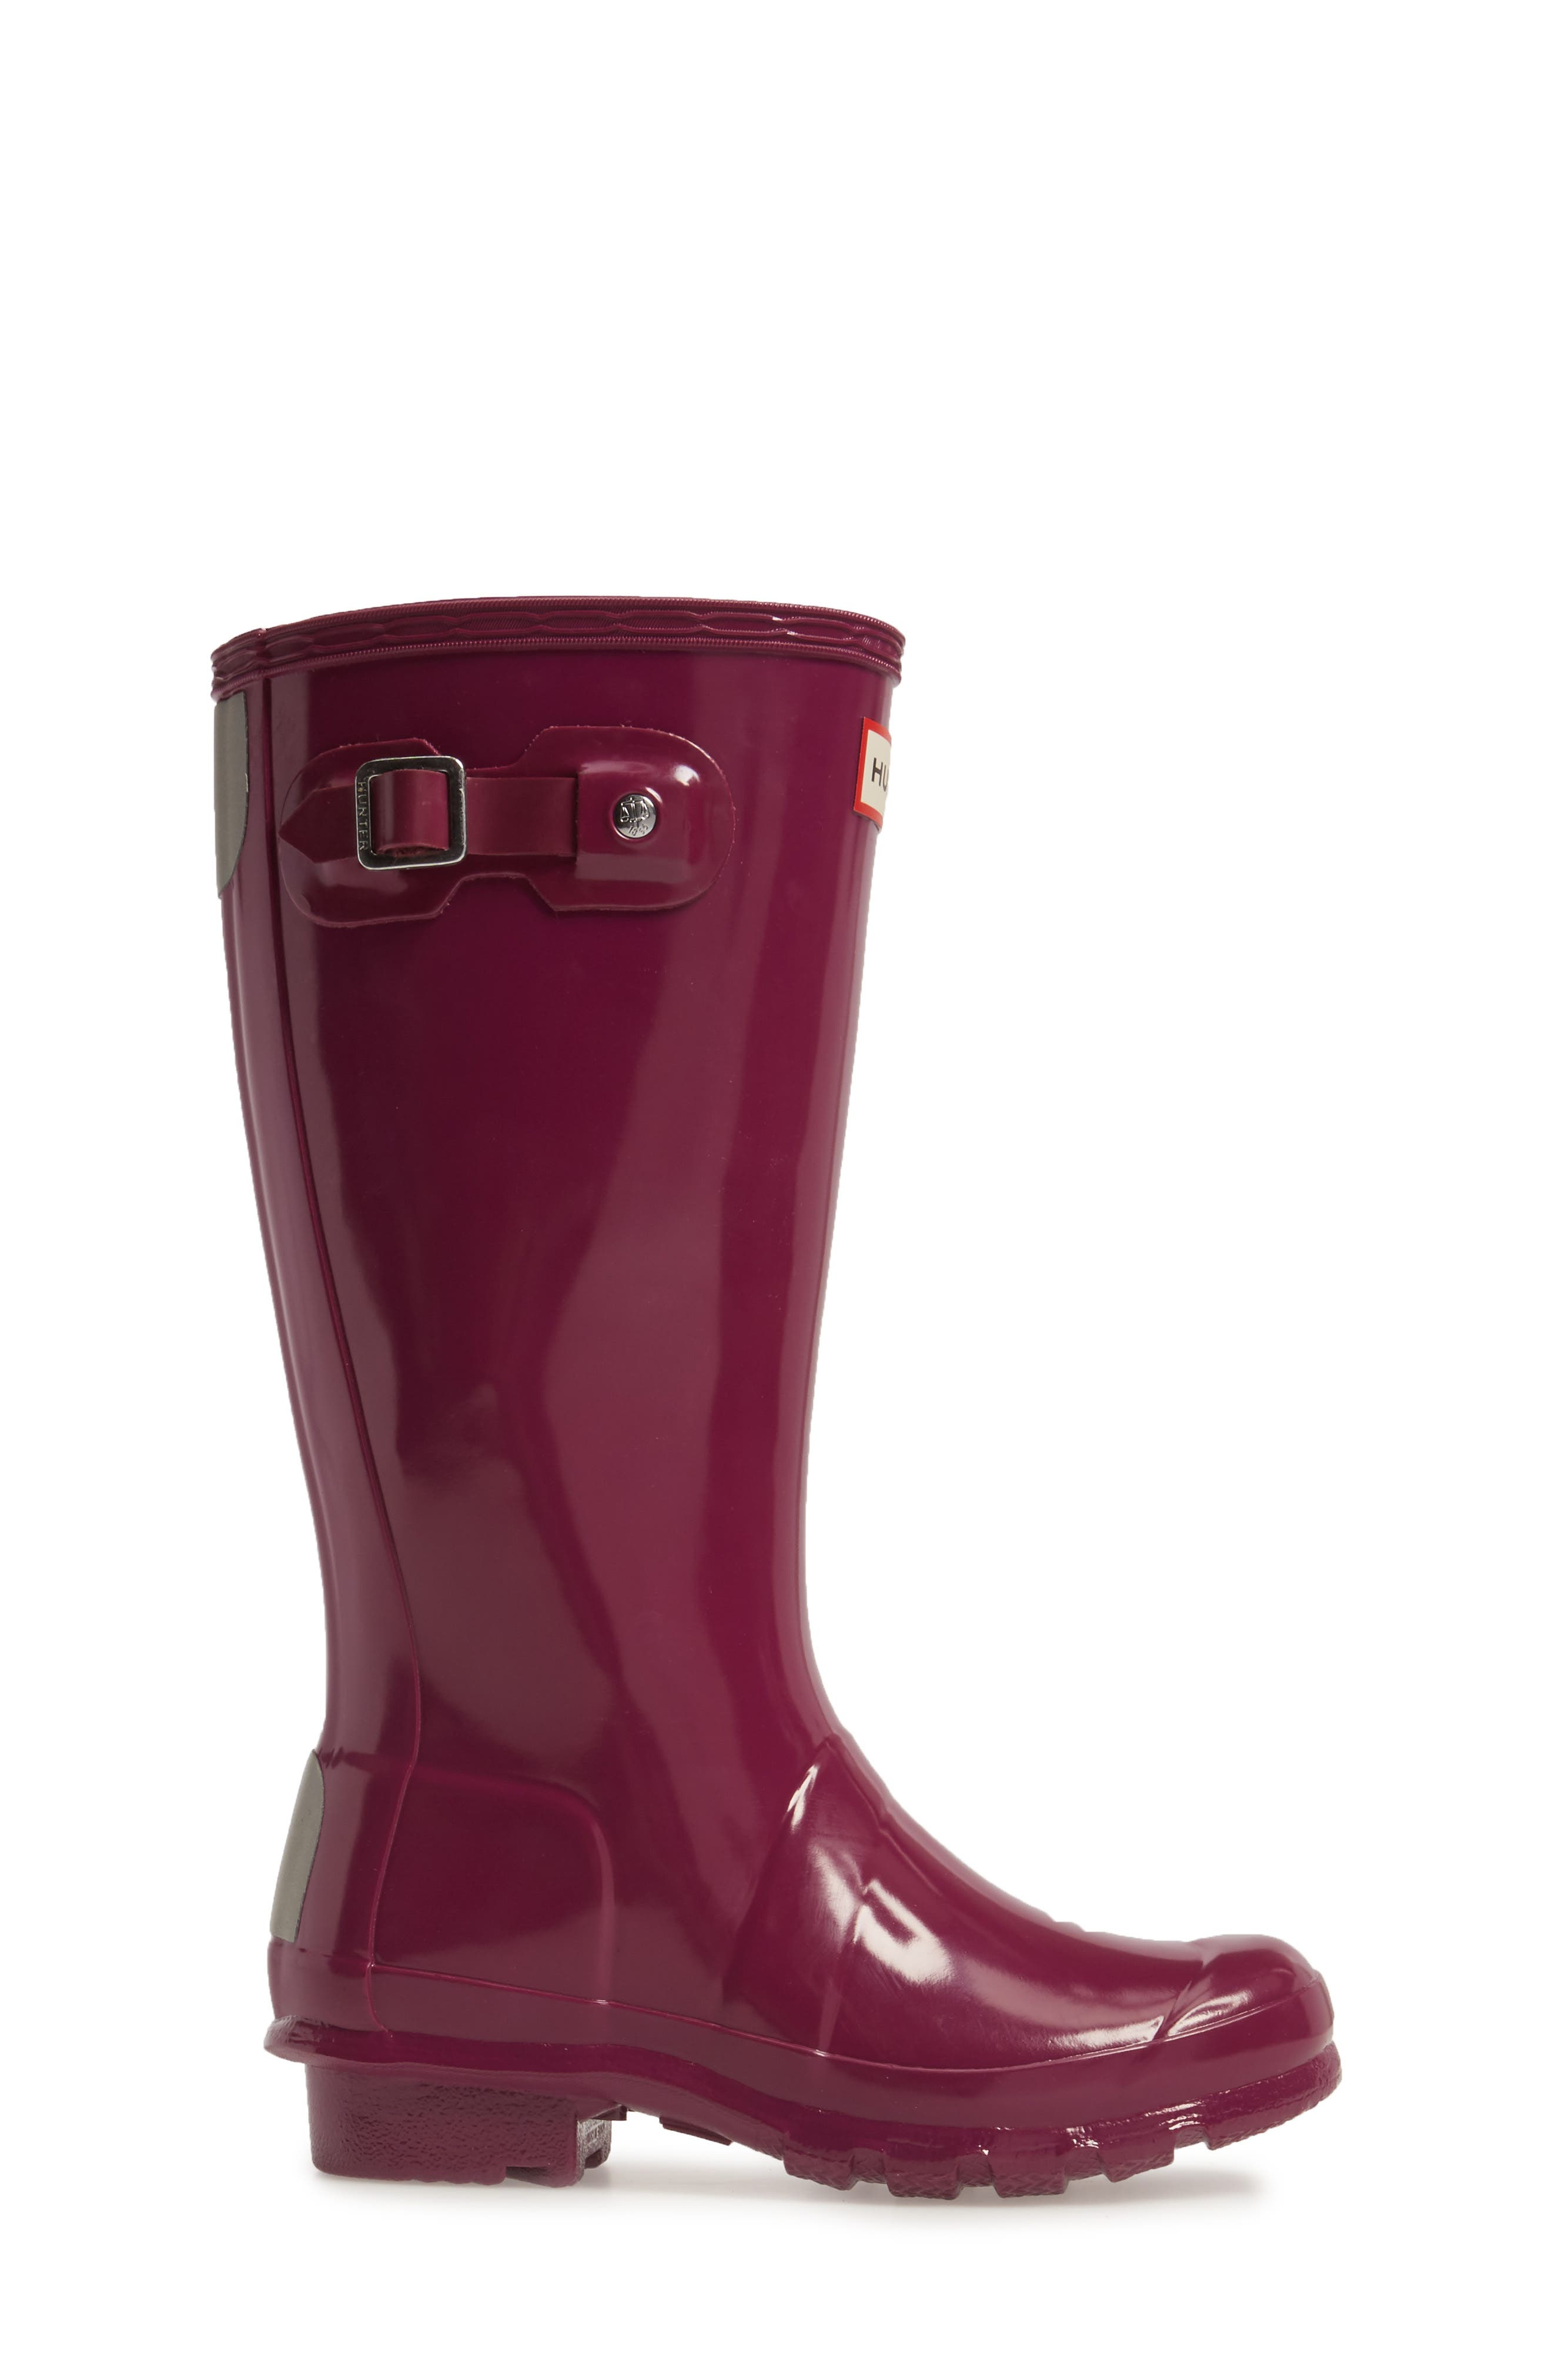 Alternate Image 3  - Hunter 'Original Gloss' Rain Boot (Little Kid & Big Kid)